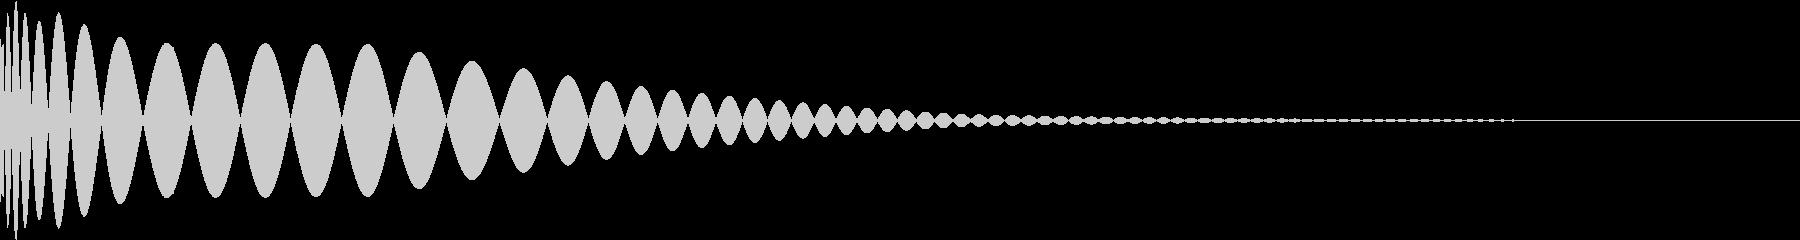 DTM Kick 62 オリジナル音源の未再生の波形